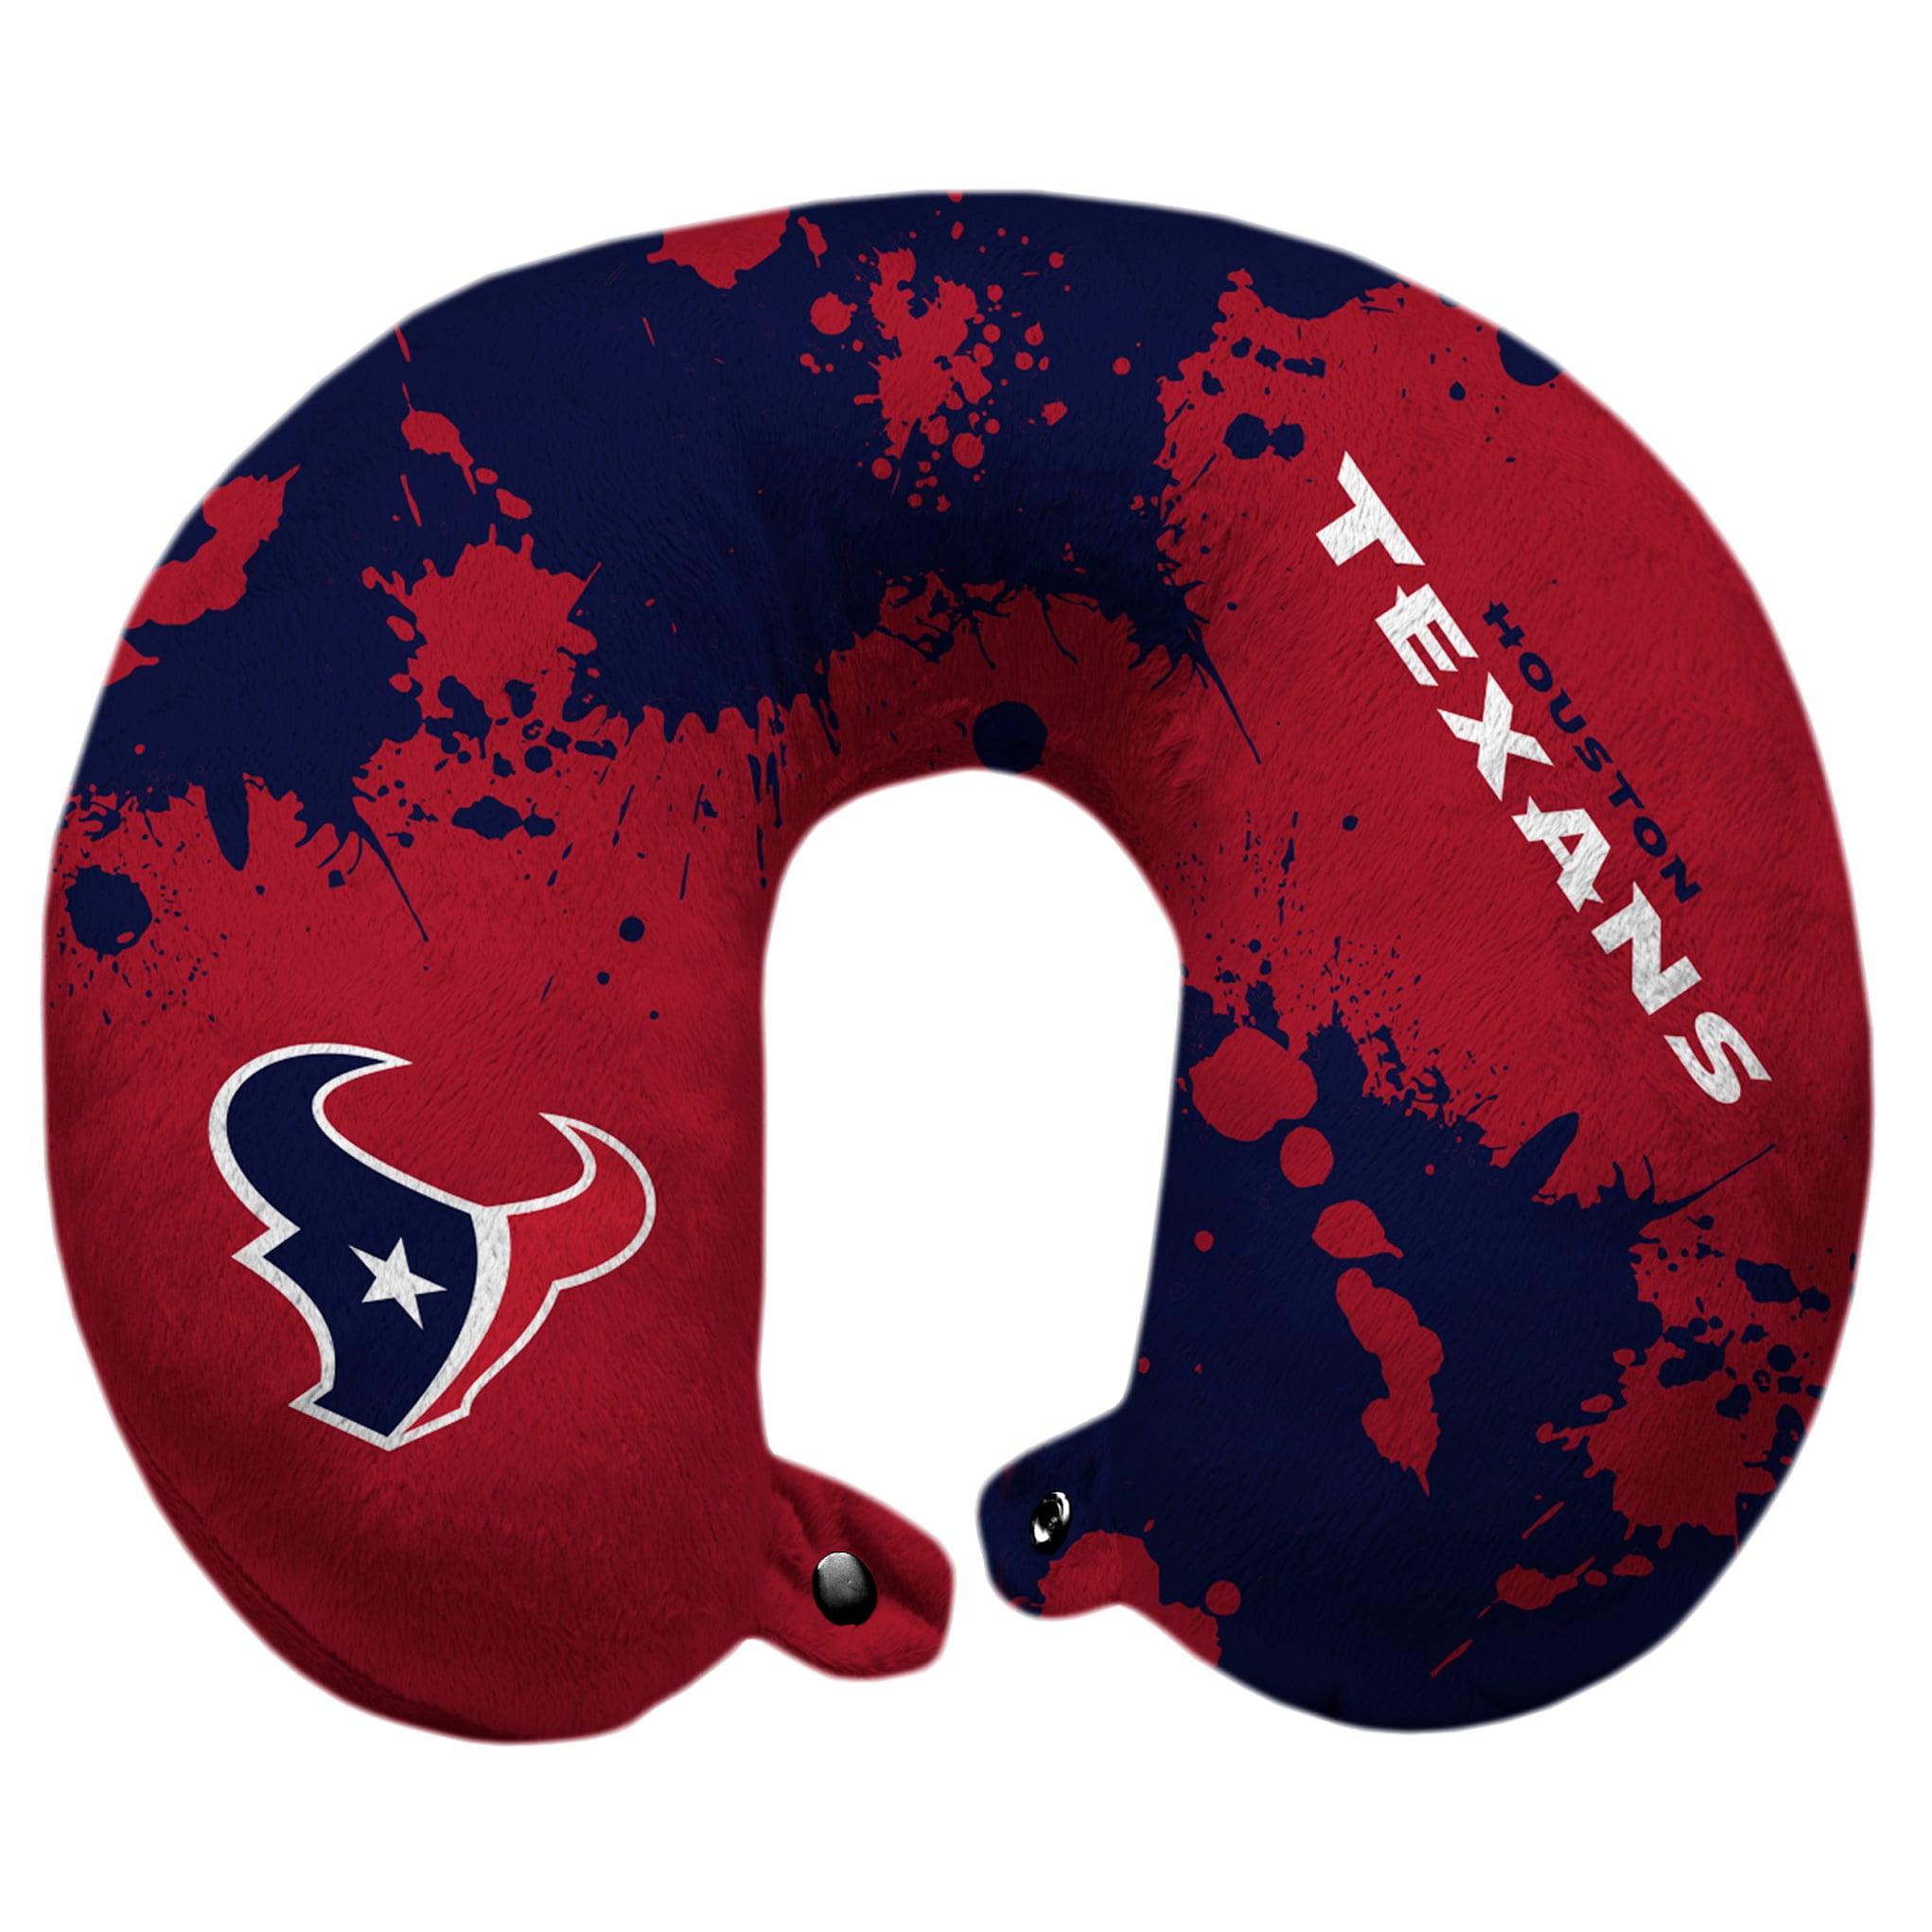 Houston Texans Splatter Polyester Snap Closure Travel Pillow - Blue